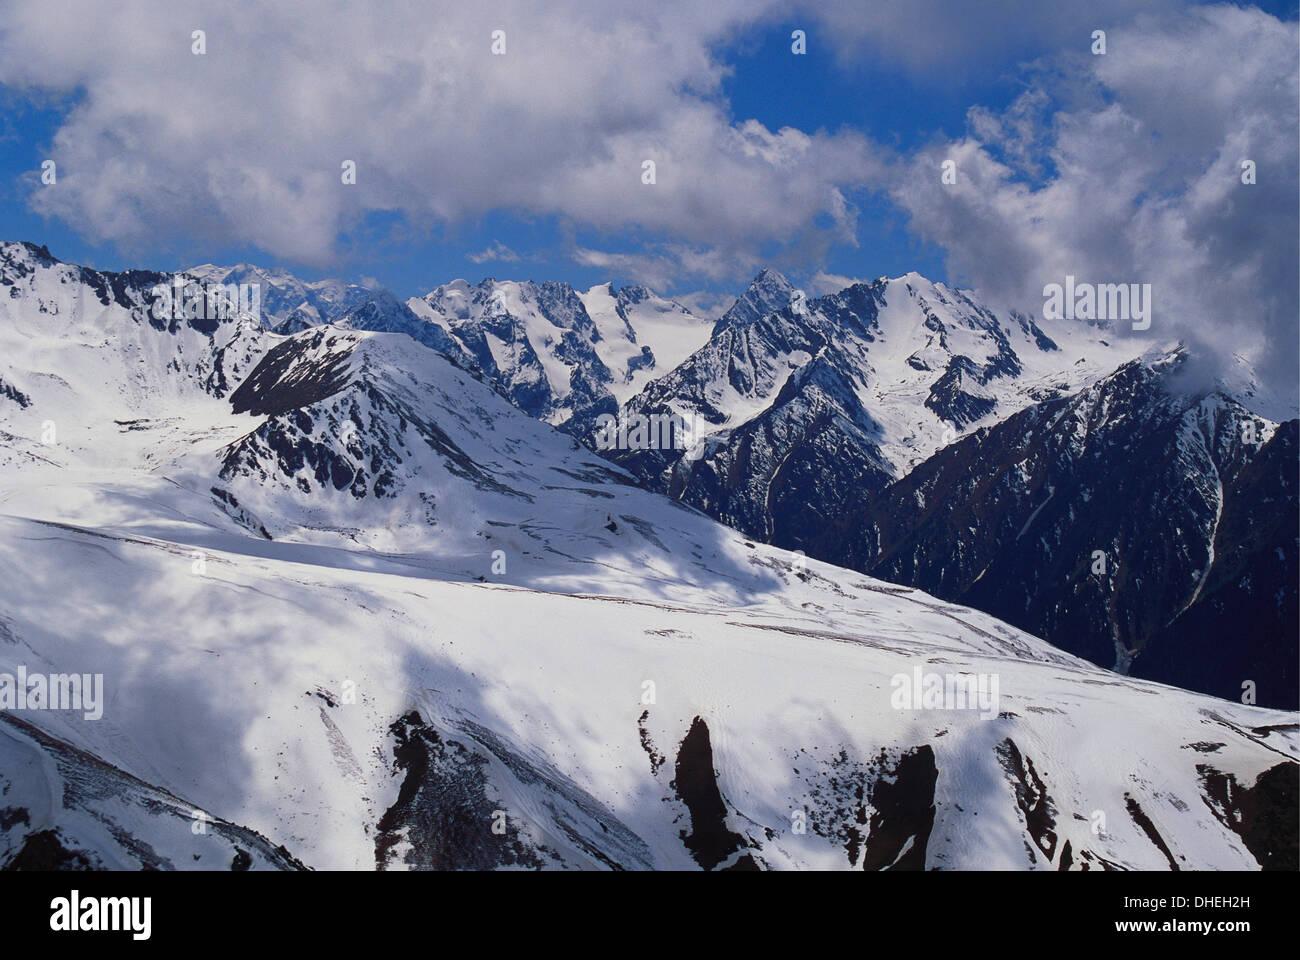 Cis Tien Shan Range Near Lake Issykkul, Kyrgyzstan - Stock Image